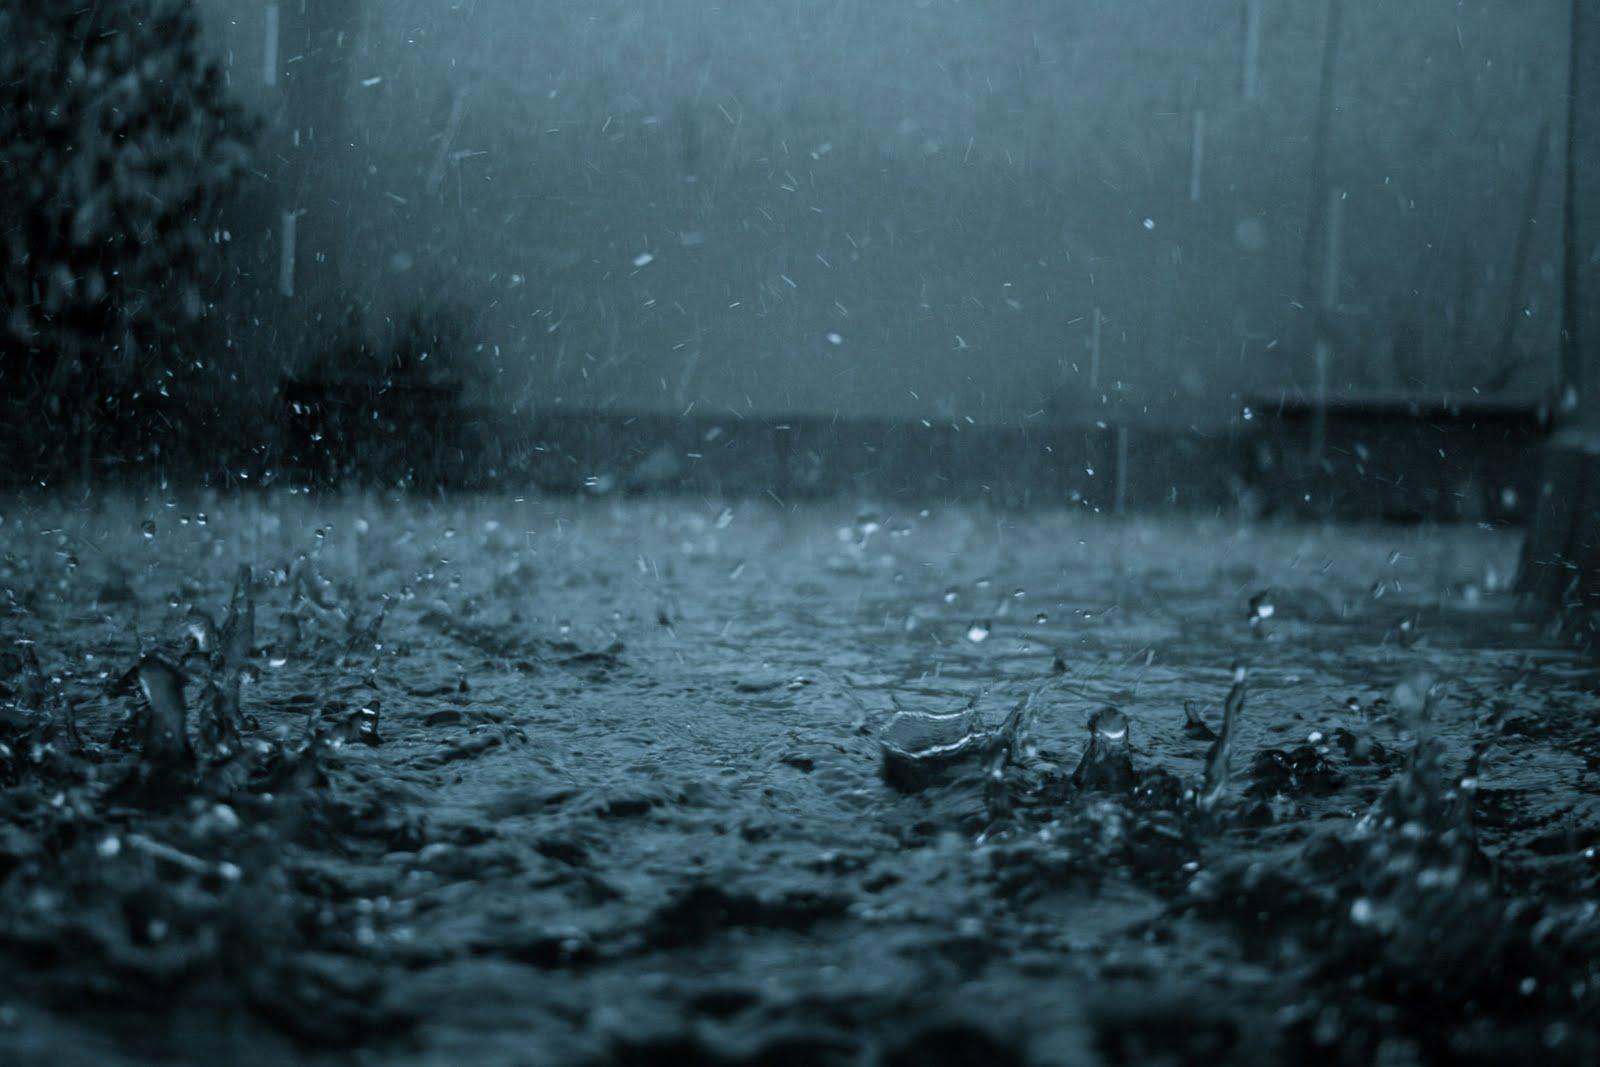 http://3.bp.blogspot.com/-iMKObwjU2UI/TcvOhxMV6zI/AAAAAAAAAZ0/z6-M3u_o0e4/s1600/rain-wallpaper.jpg